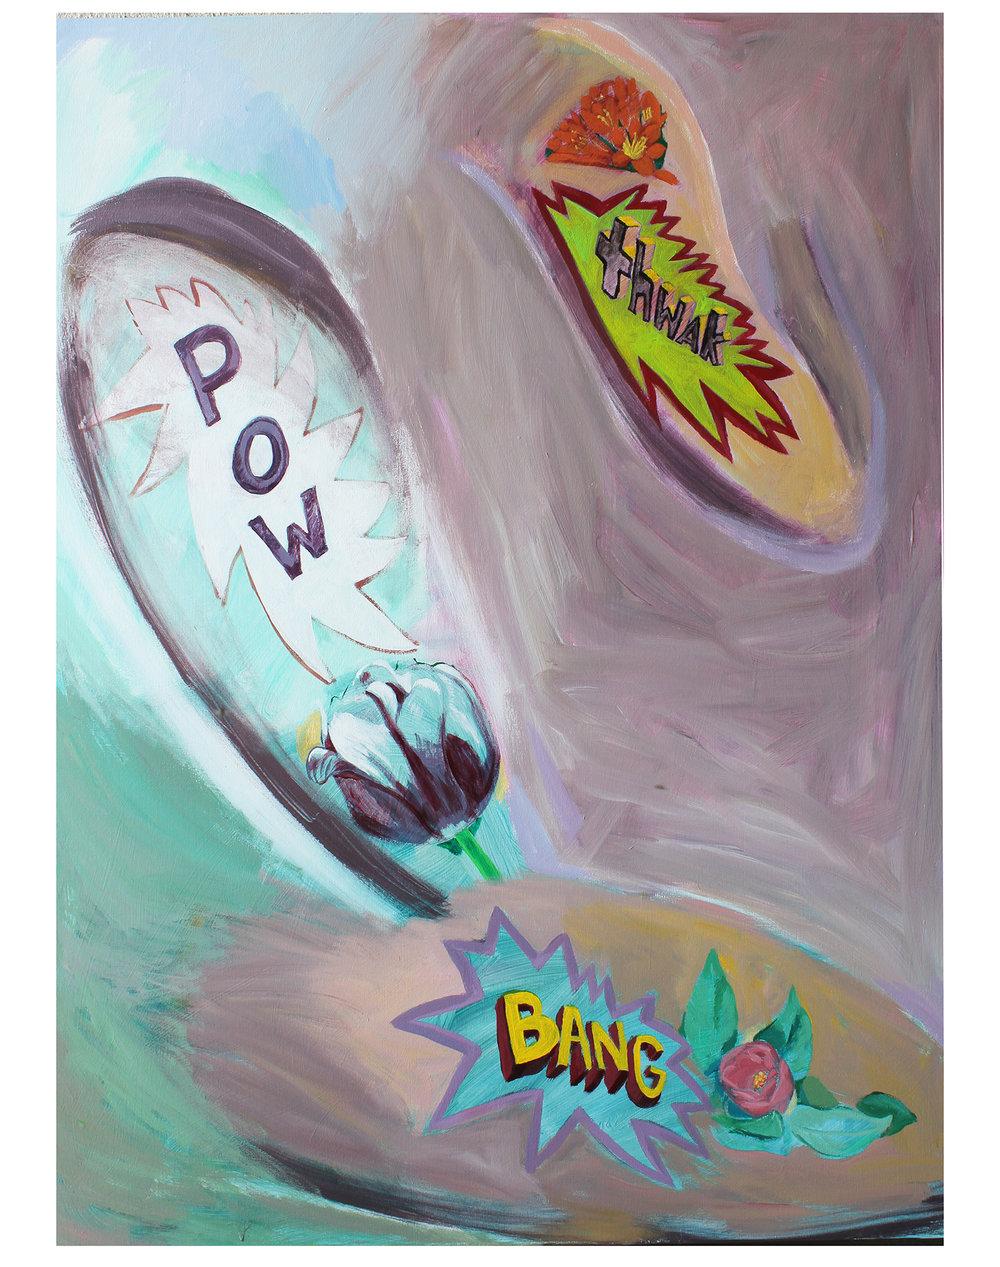 pow thwak bang painting_2331 crop adj D_GLYNN.jpg